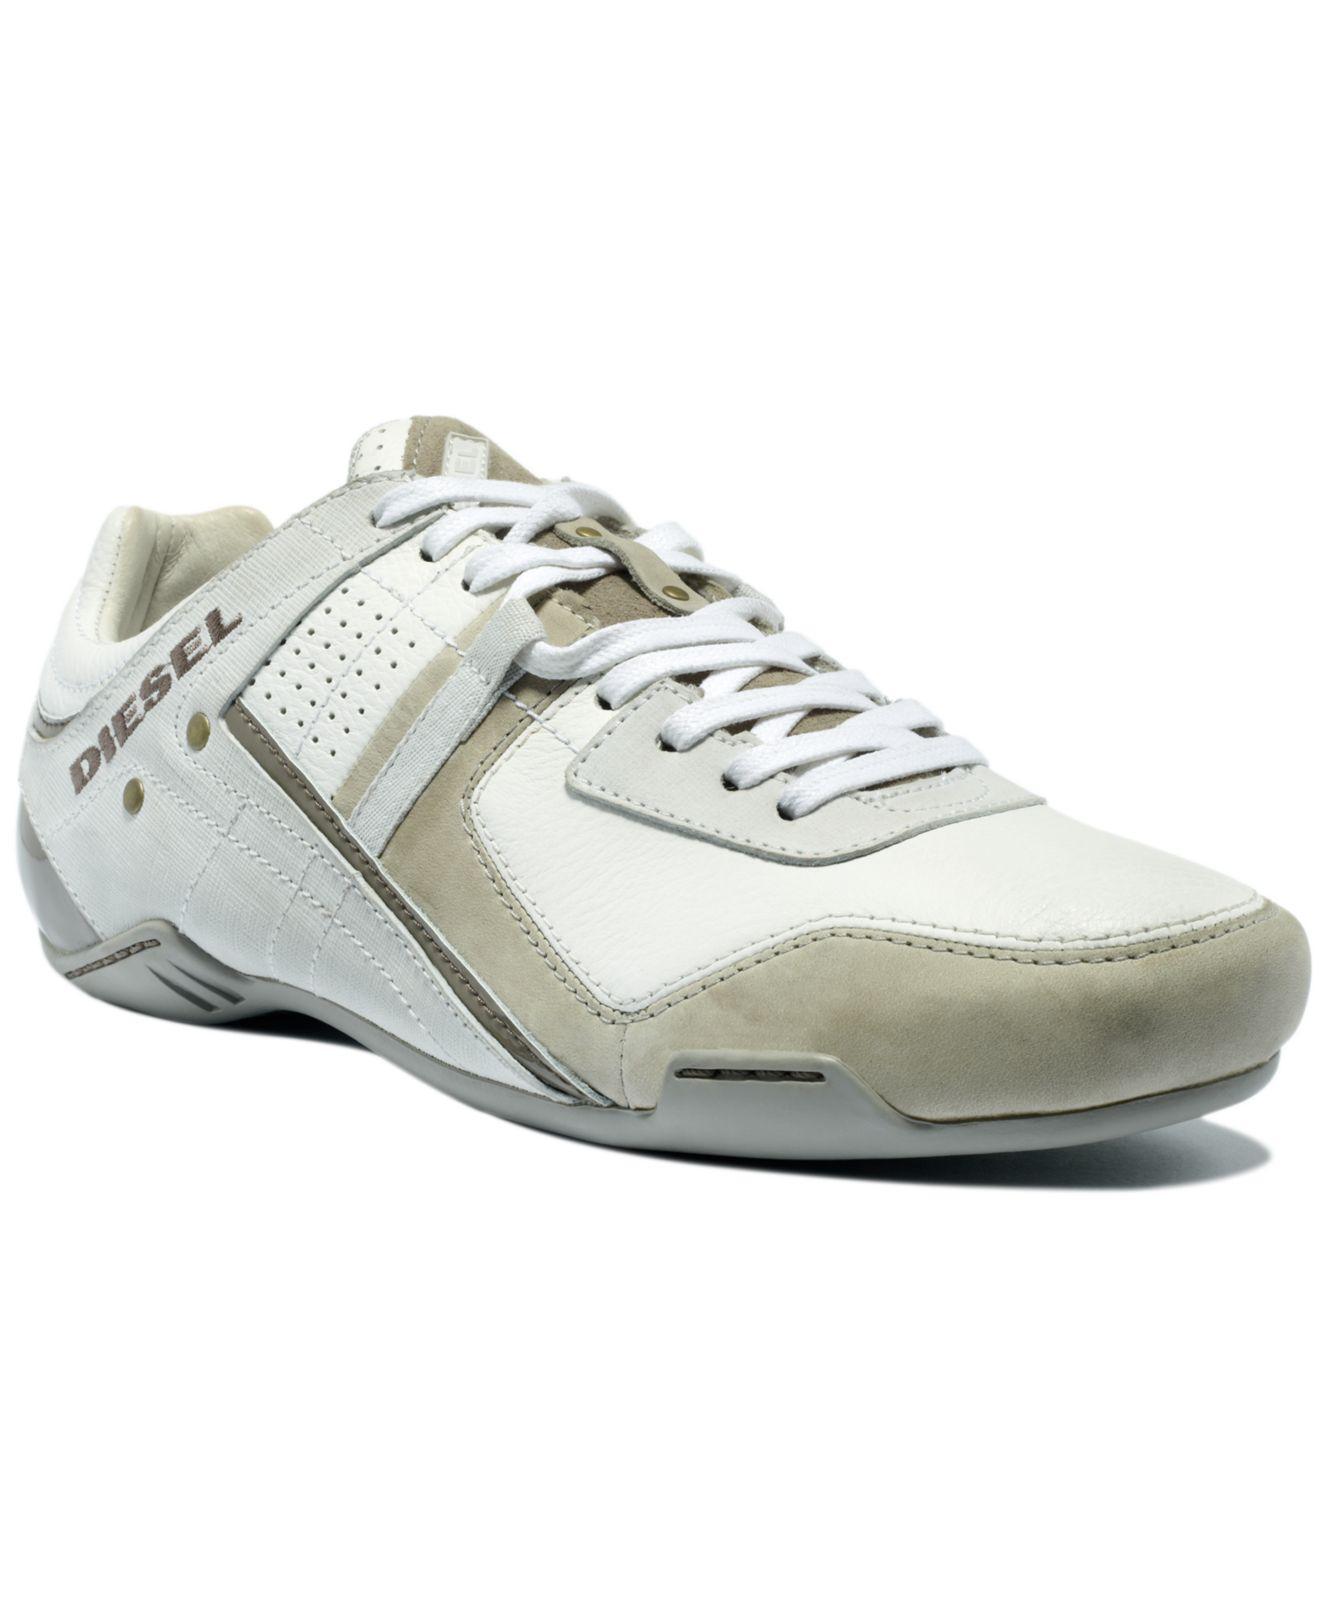 Diesel Korbin Sneakers In White For Men Lyst